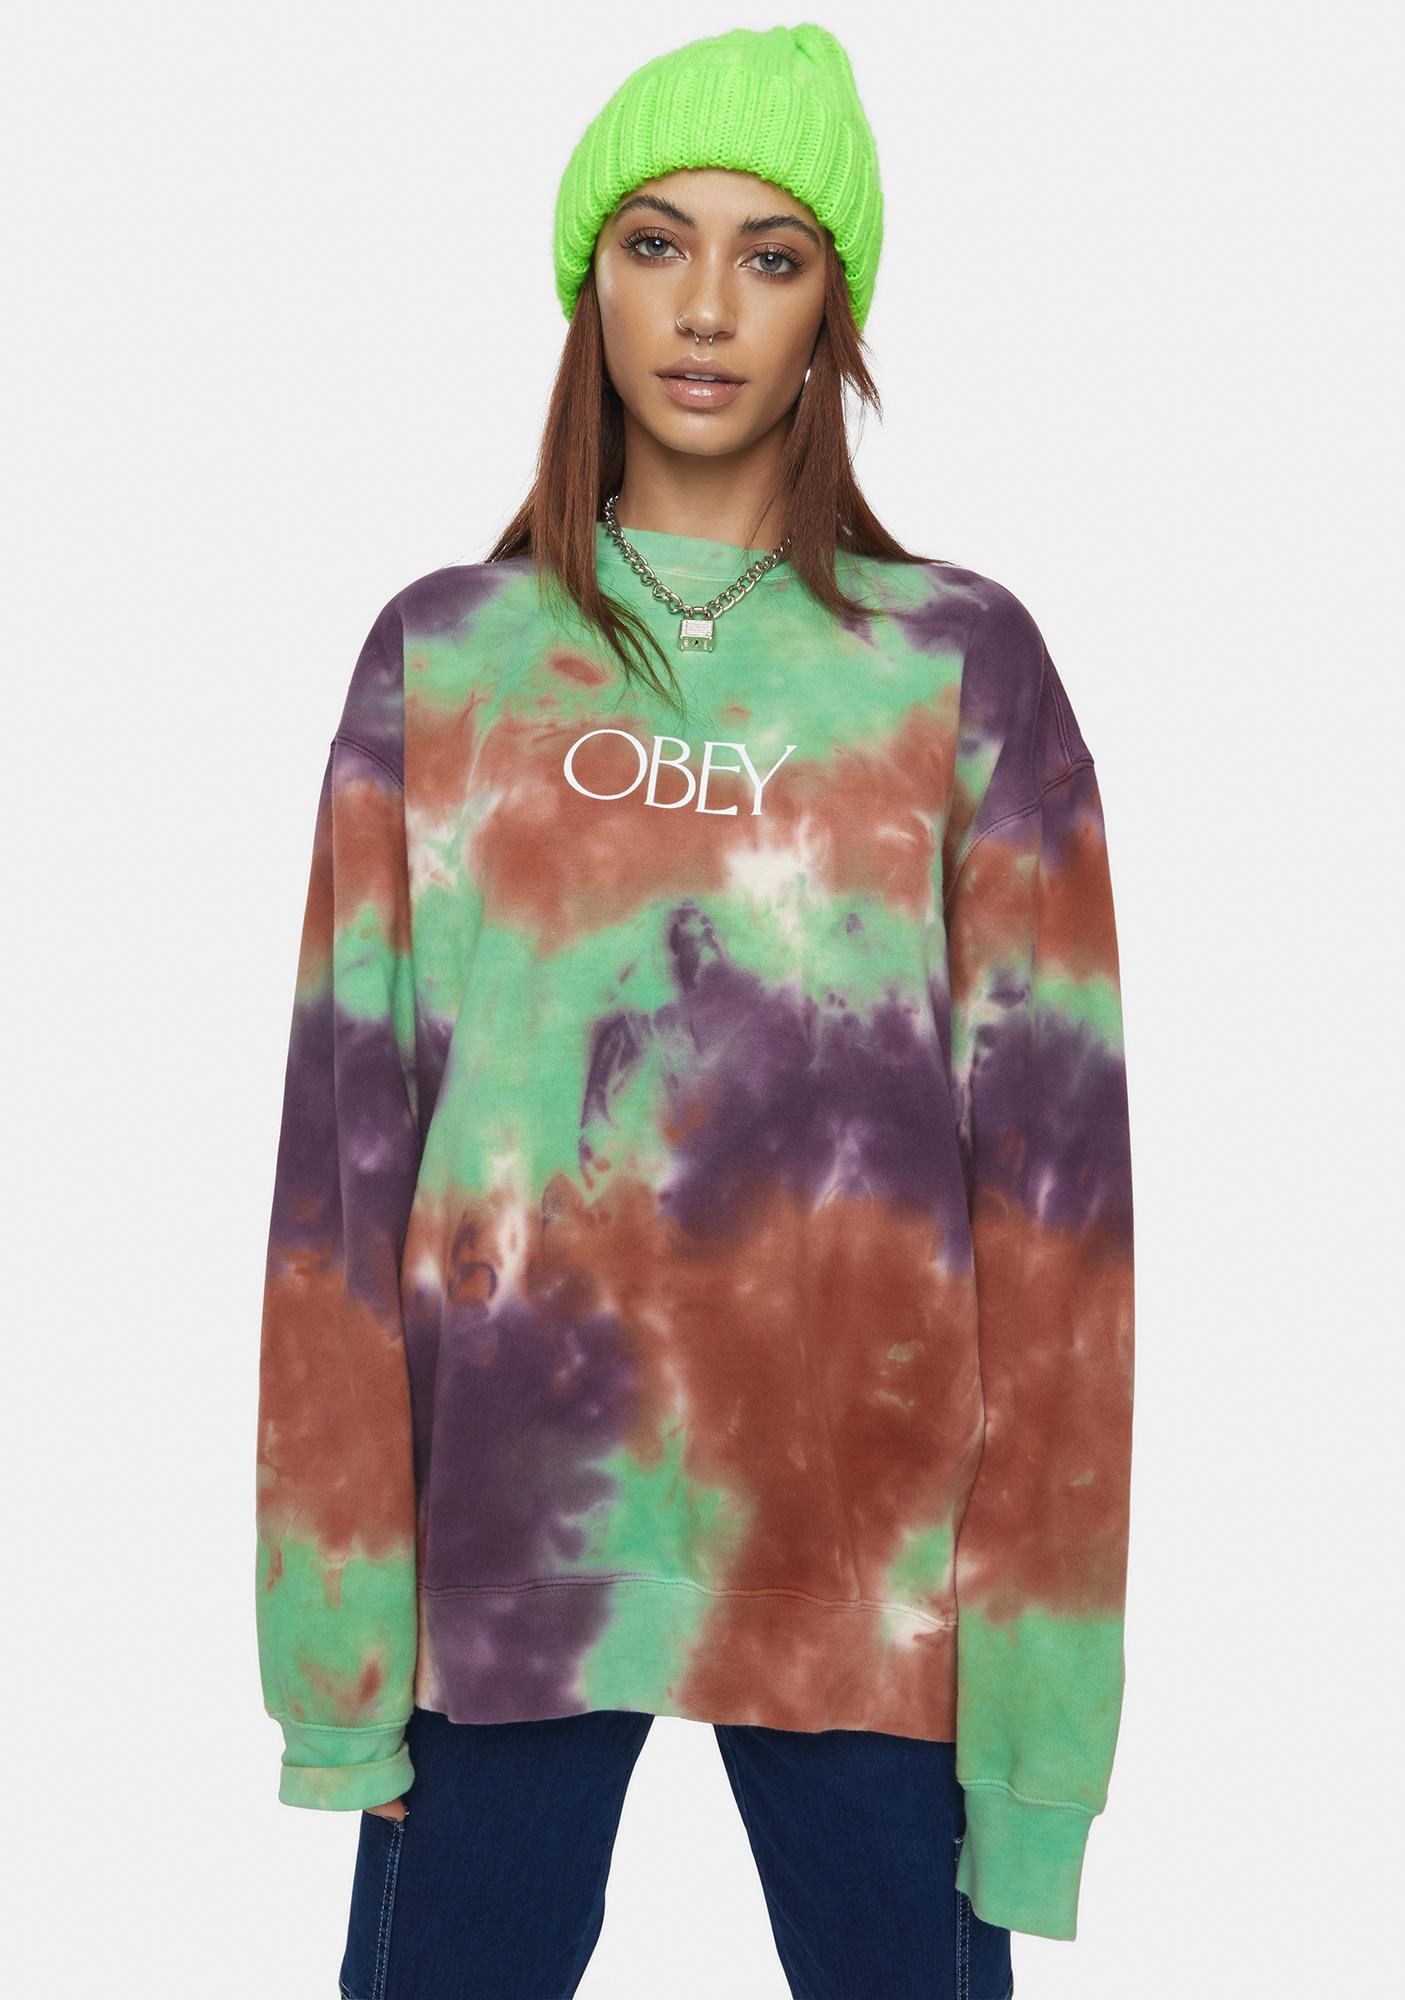 Obey Green Ash Regent Premium Tie Dye Crewneck